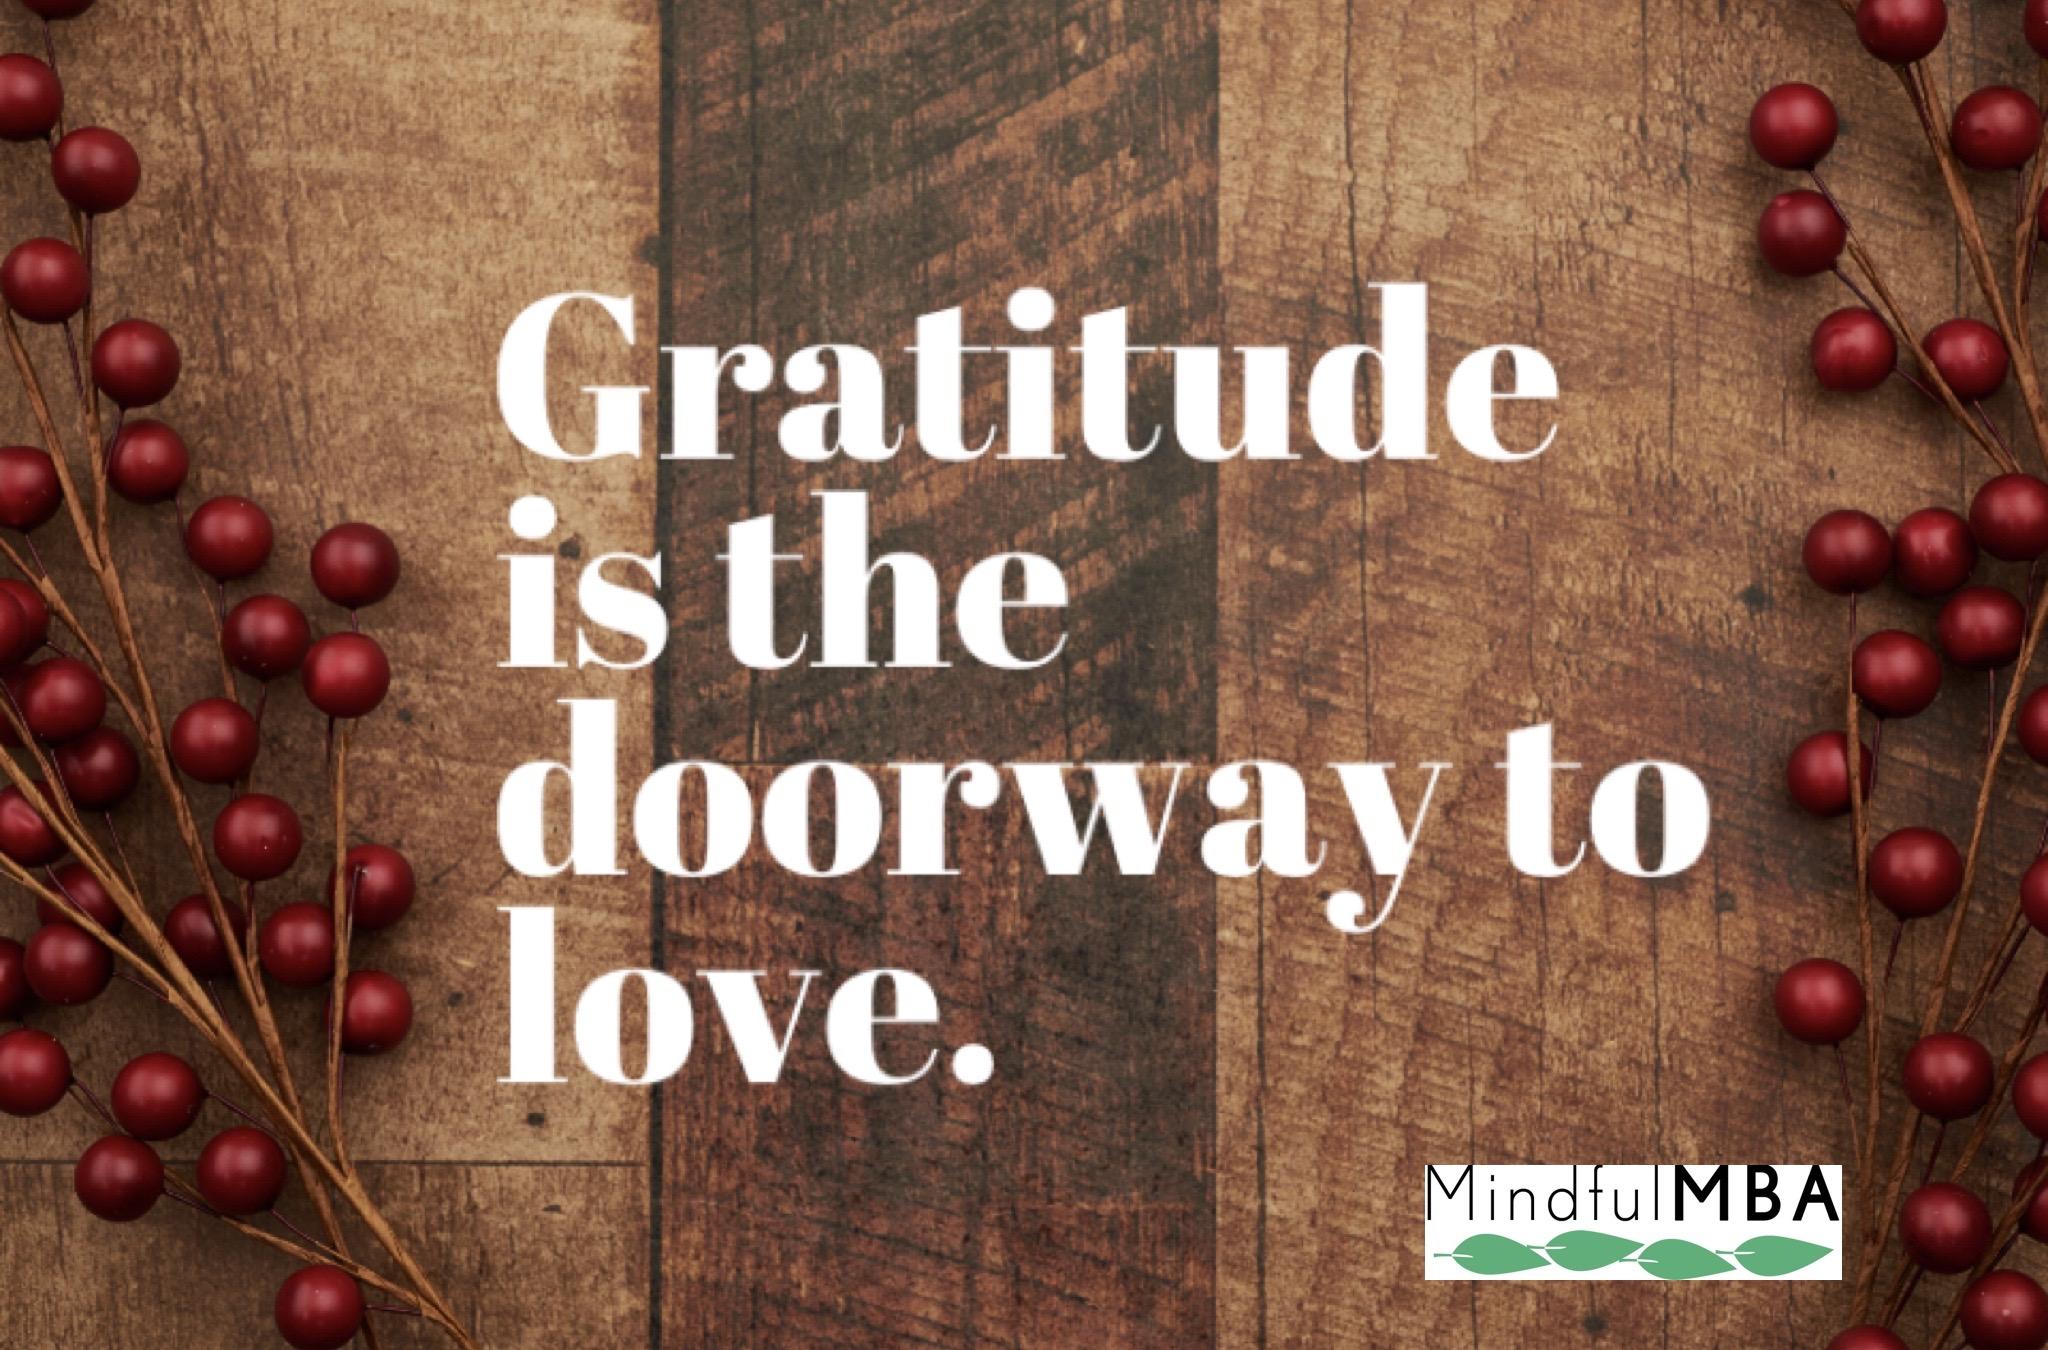 Gratitude love cropped W LOGO